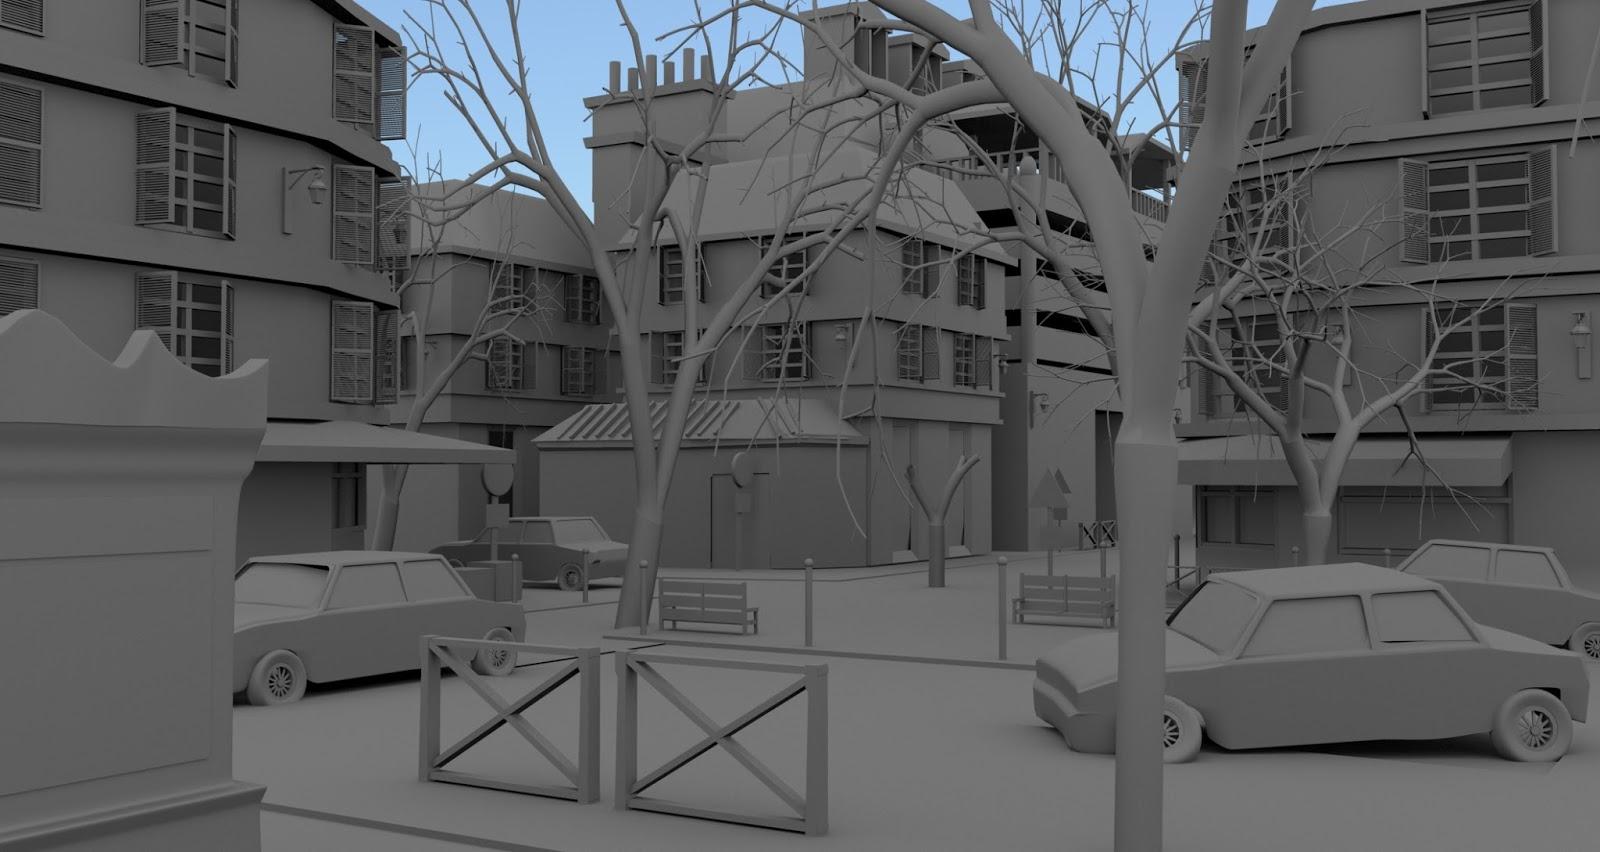 Deepak Kadam: 3d modeling and texturing